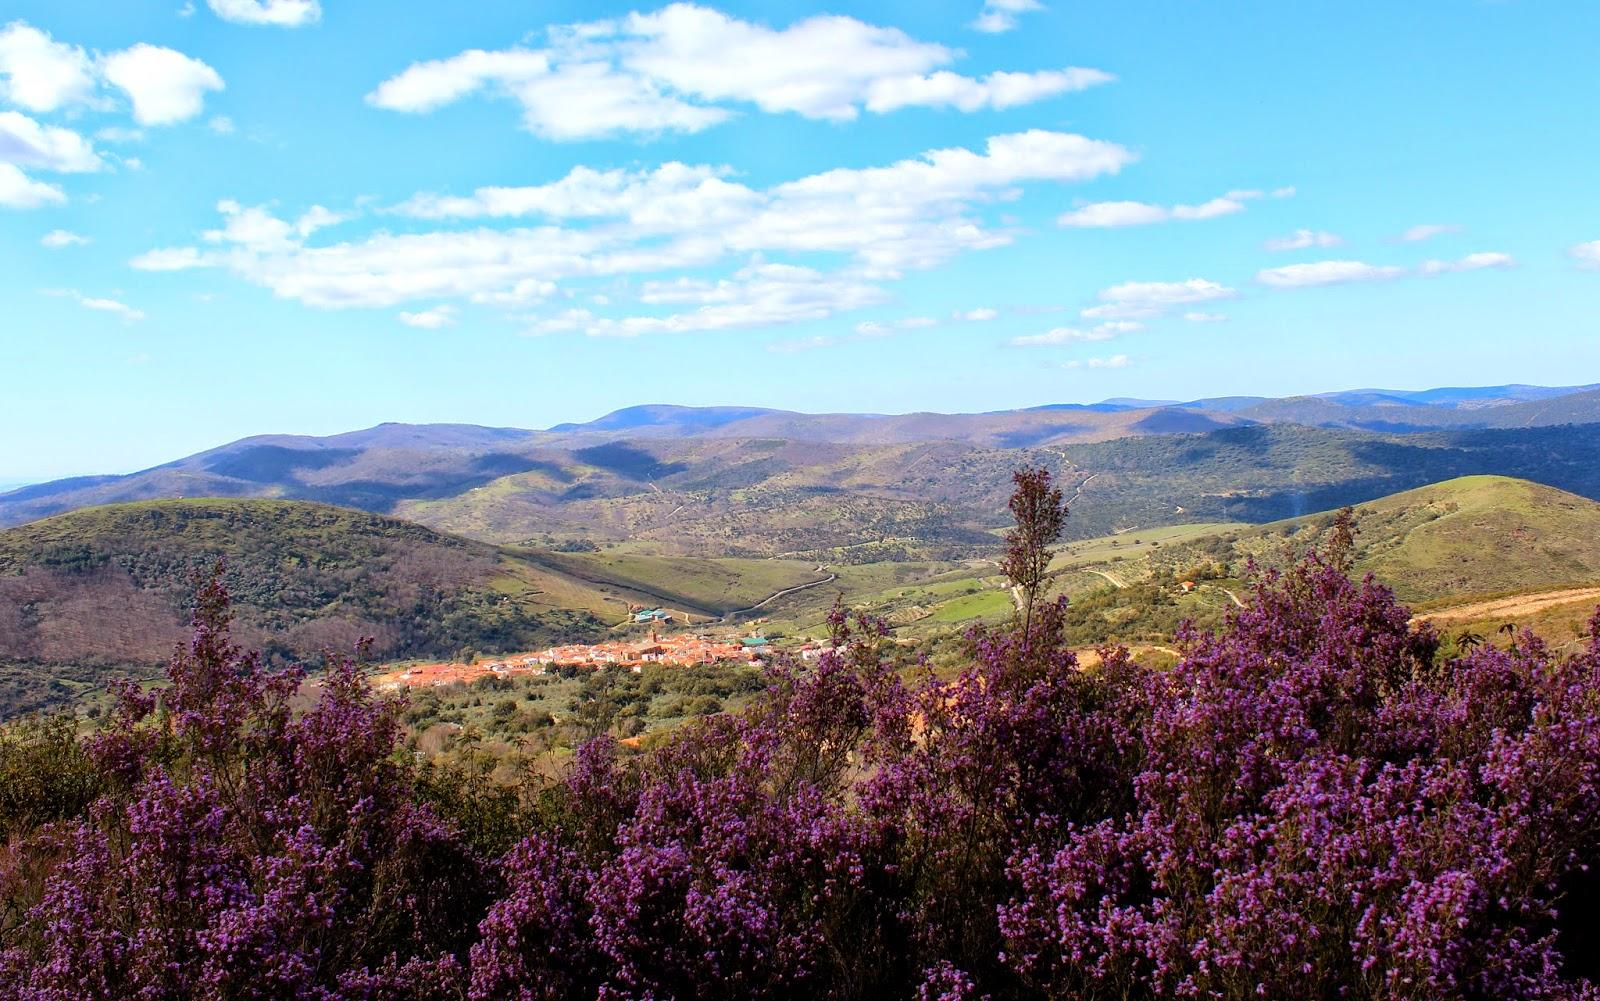 Paisajes de Berzocana-Cáceres